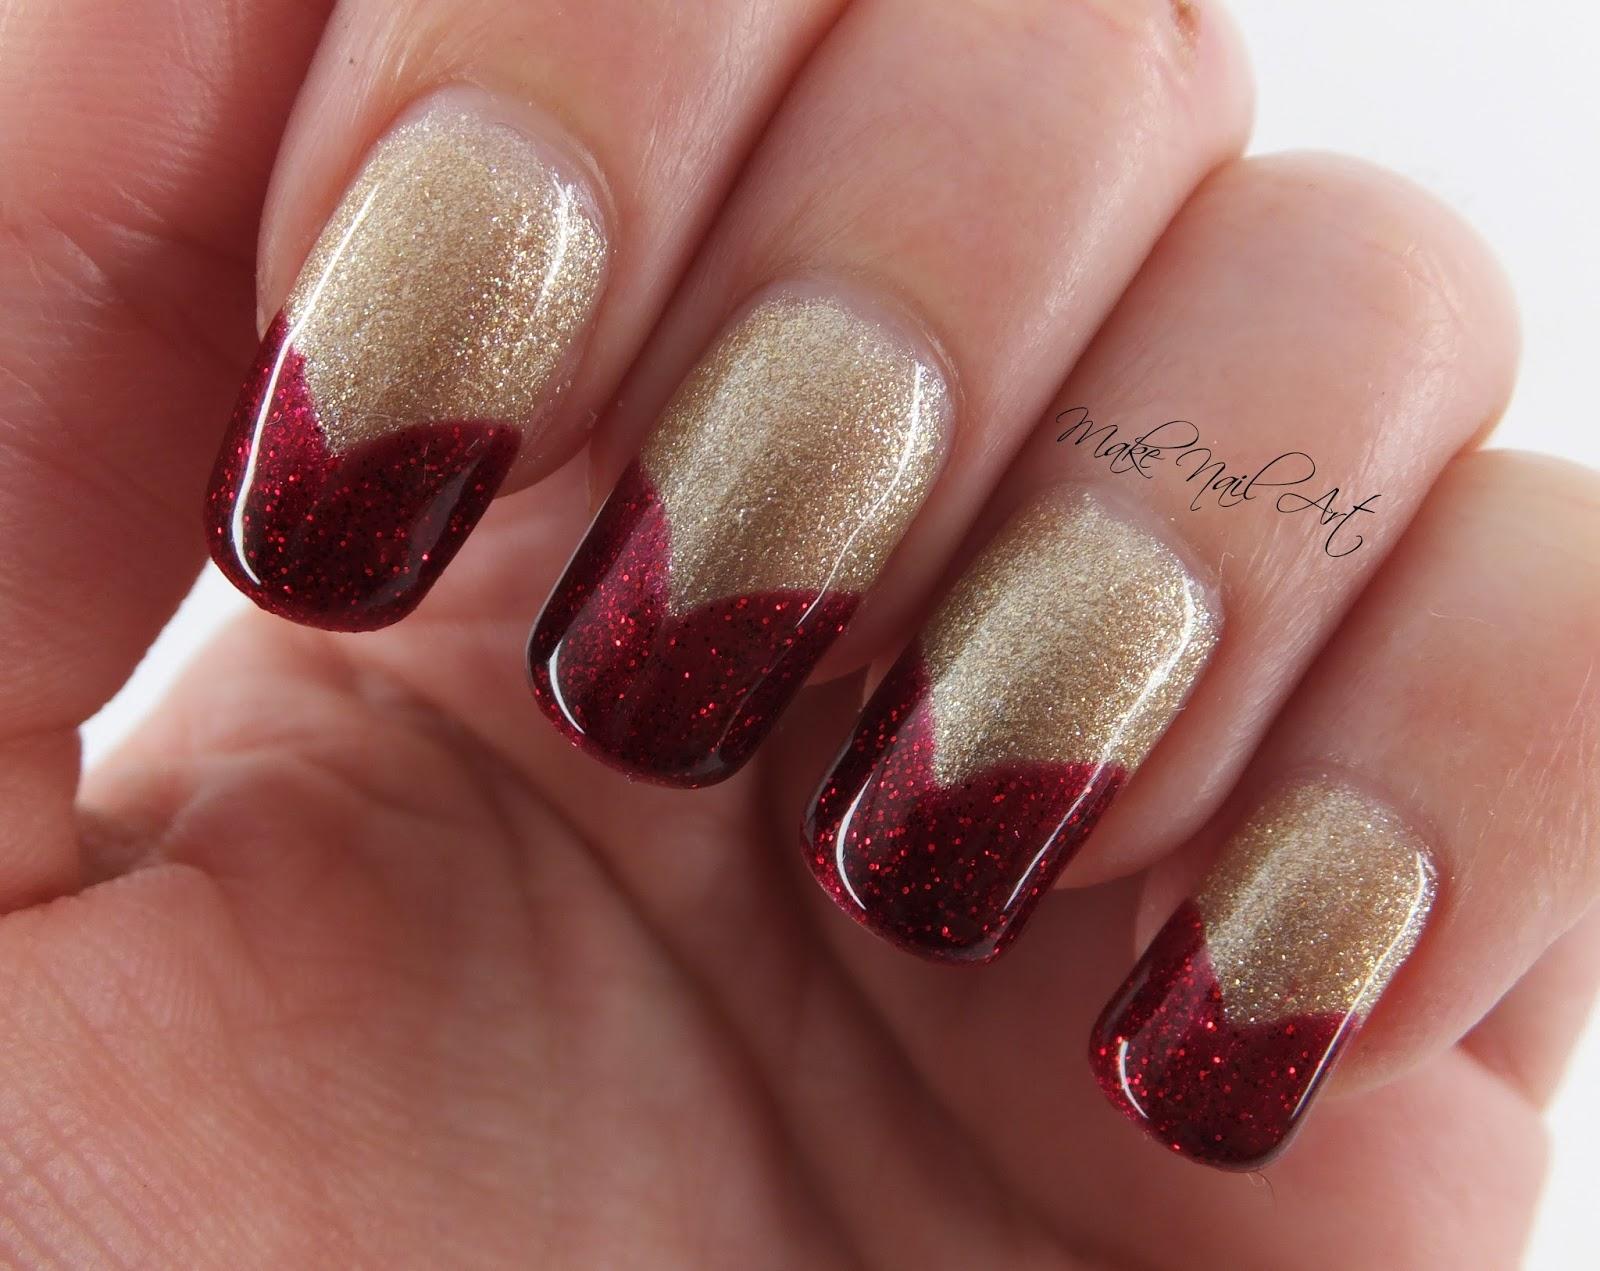 Make Nail Art: Red And Gold Glitter Gel Polish French Manicure Nail ...